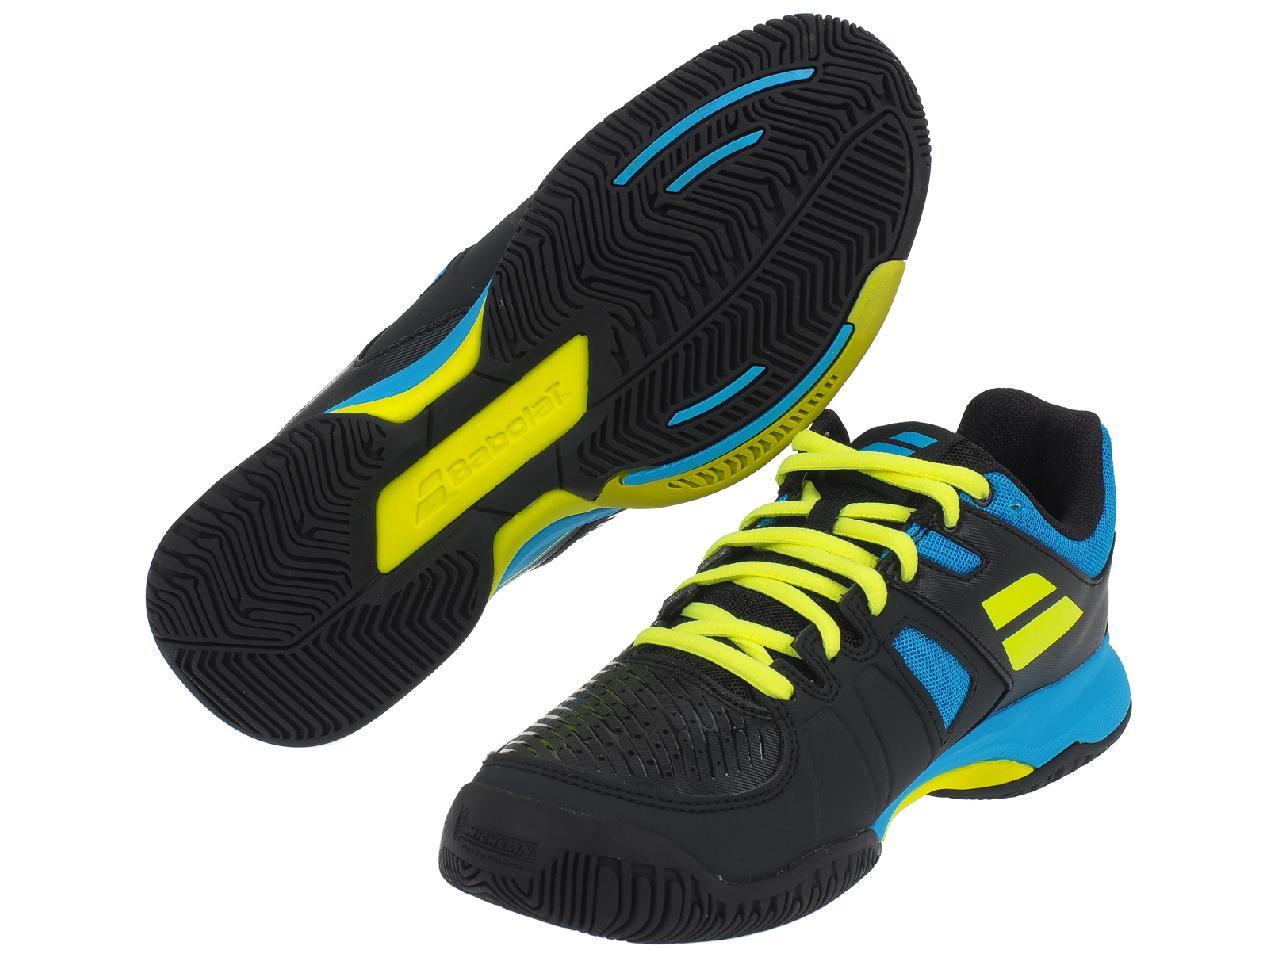 Babolat Chaussures de tennis Cud pulsion ac adulte Babolat G3vapA